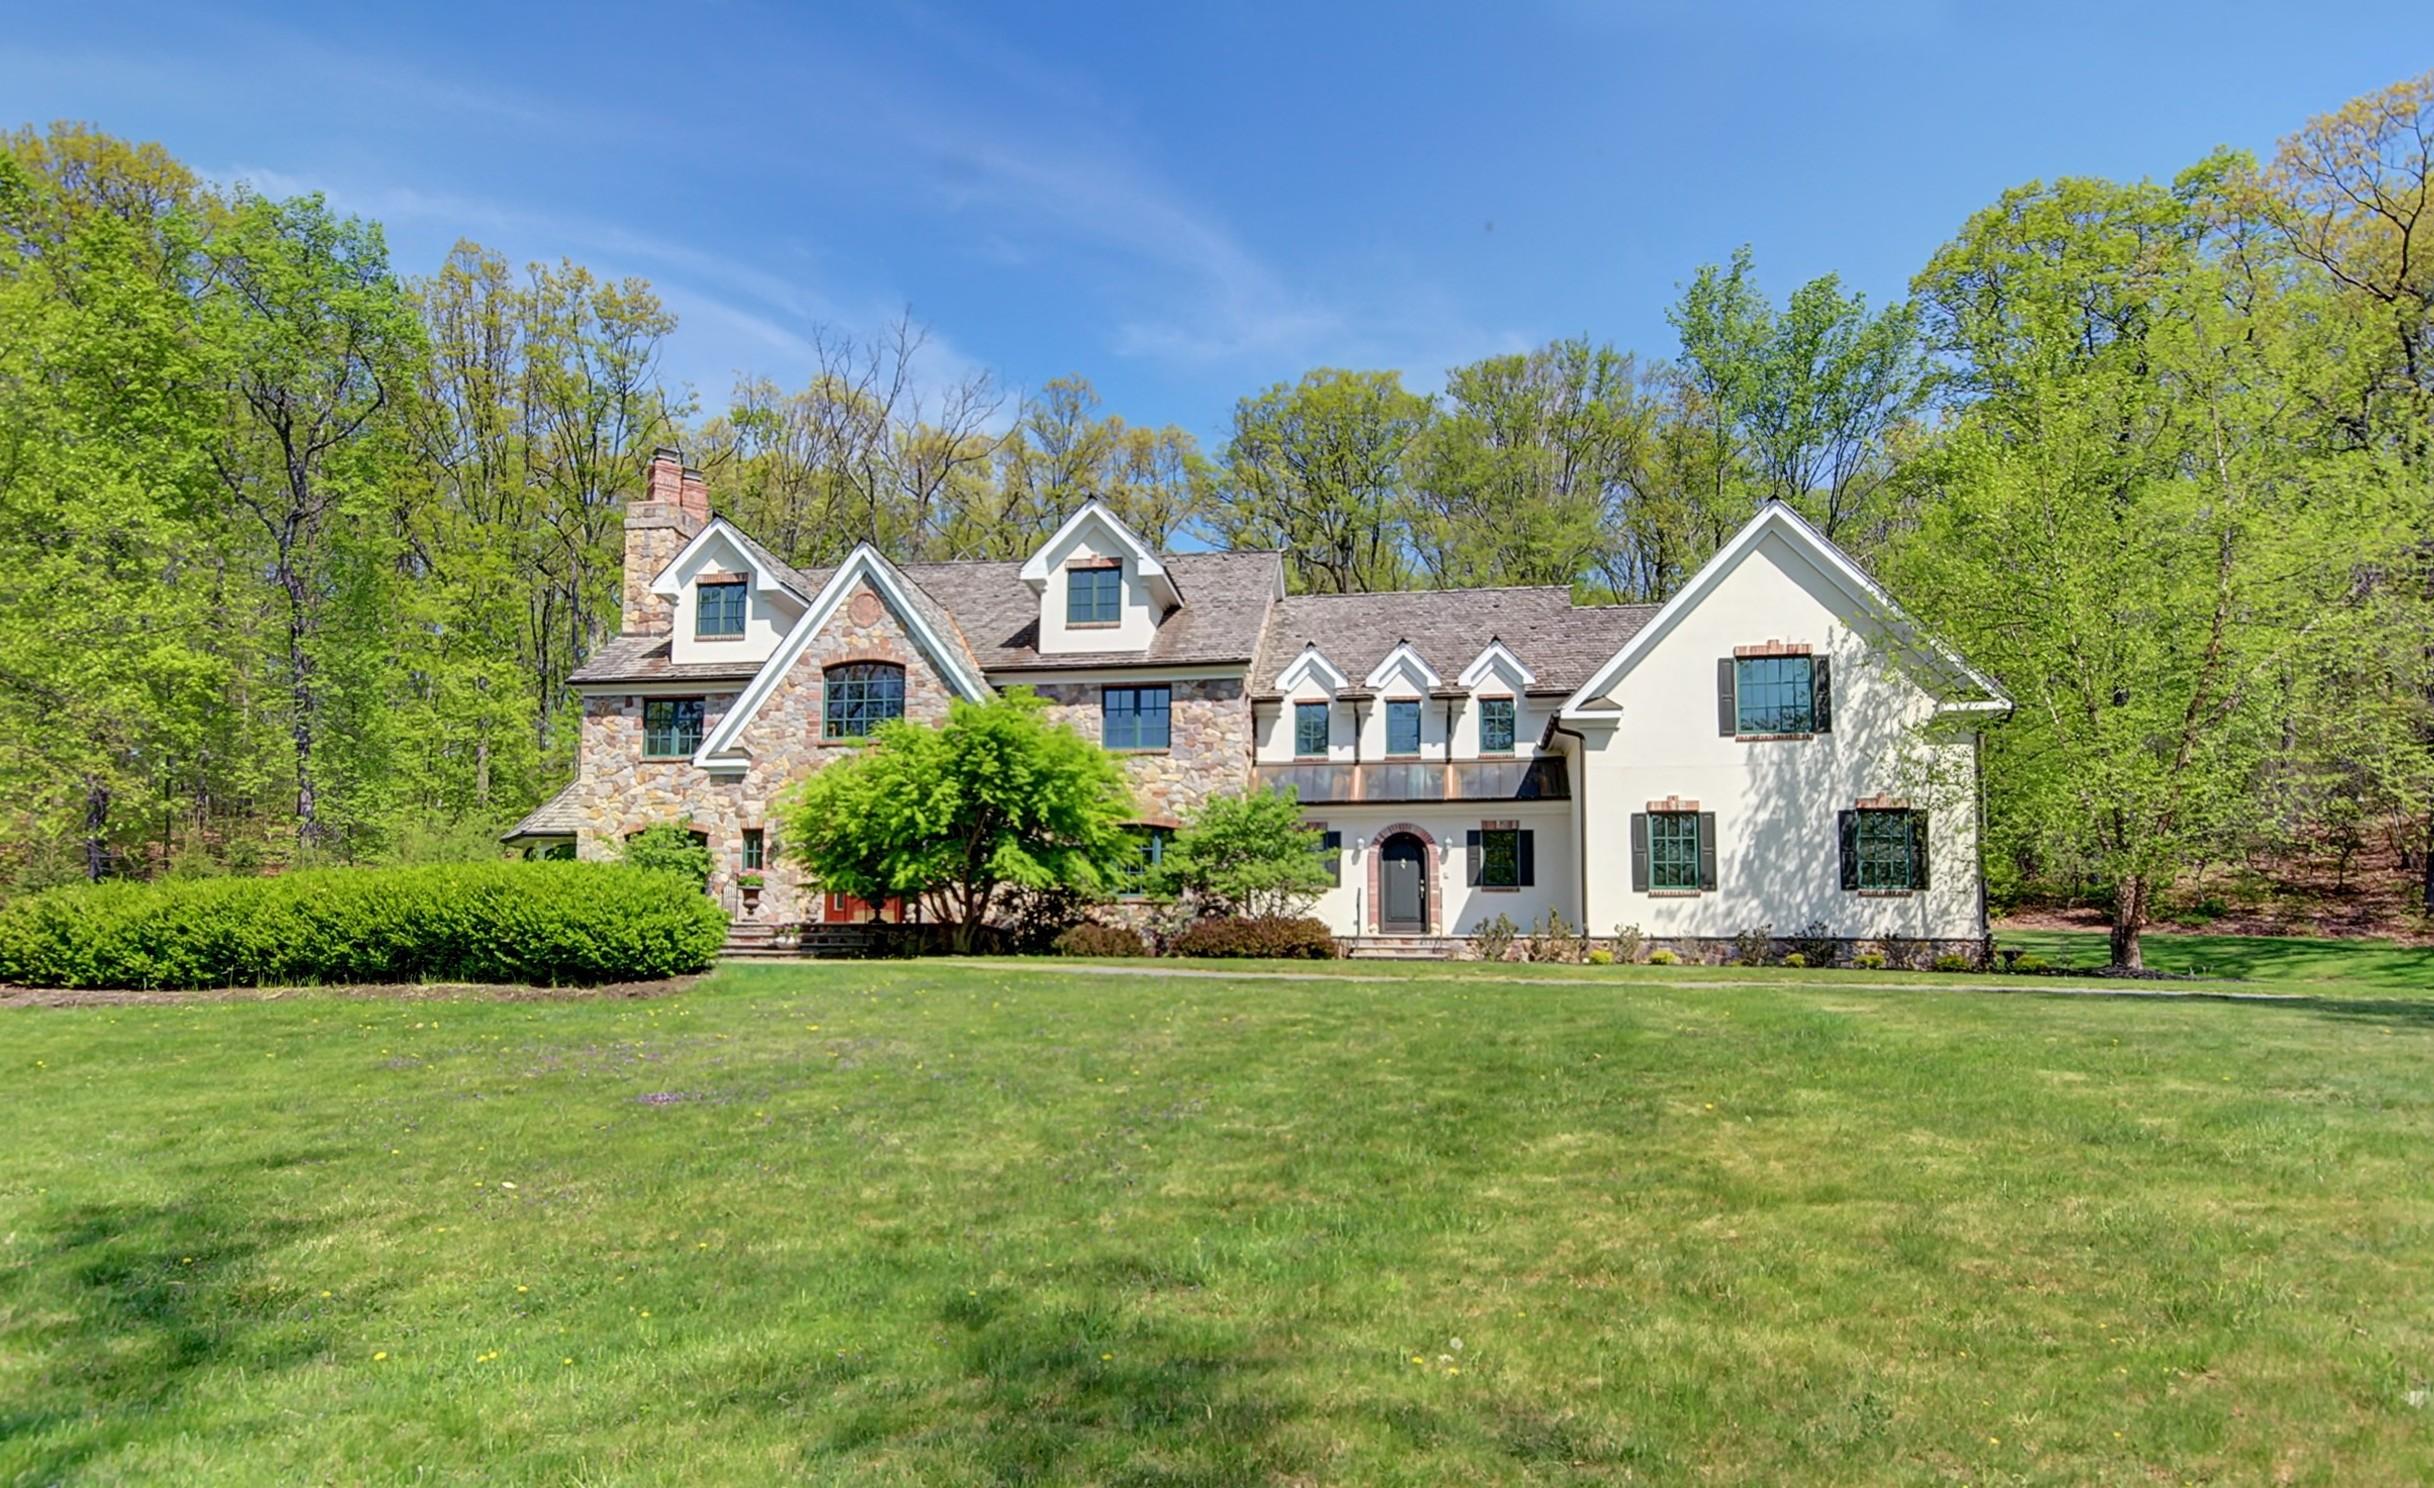 1 Elegant Estate Home in Winston Farm 166544-008  Main cropped.jpg